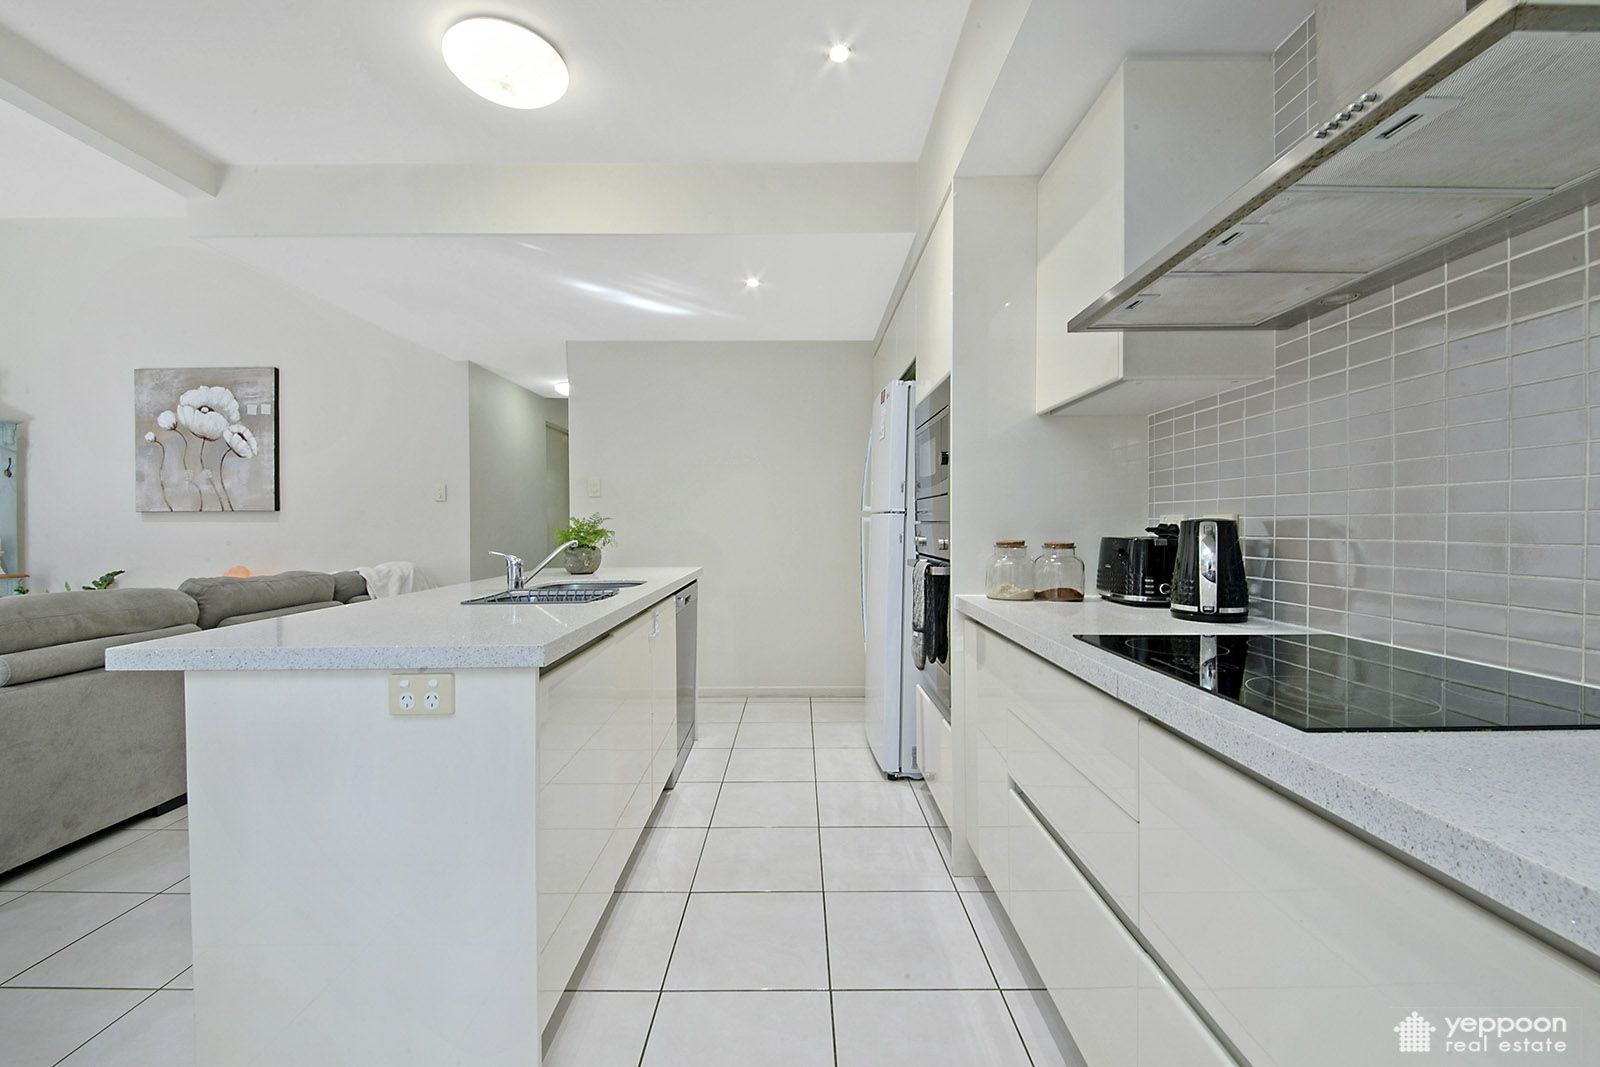 2/20 Melbourne Street, Yeppoon QLD 4703, Image 0